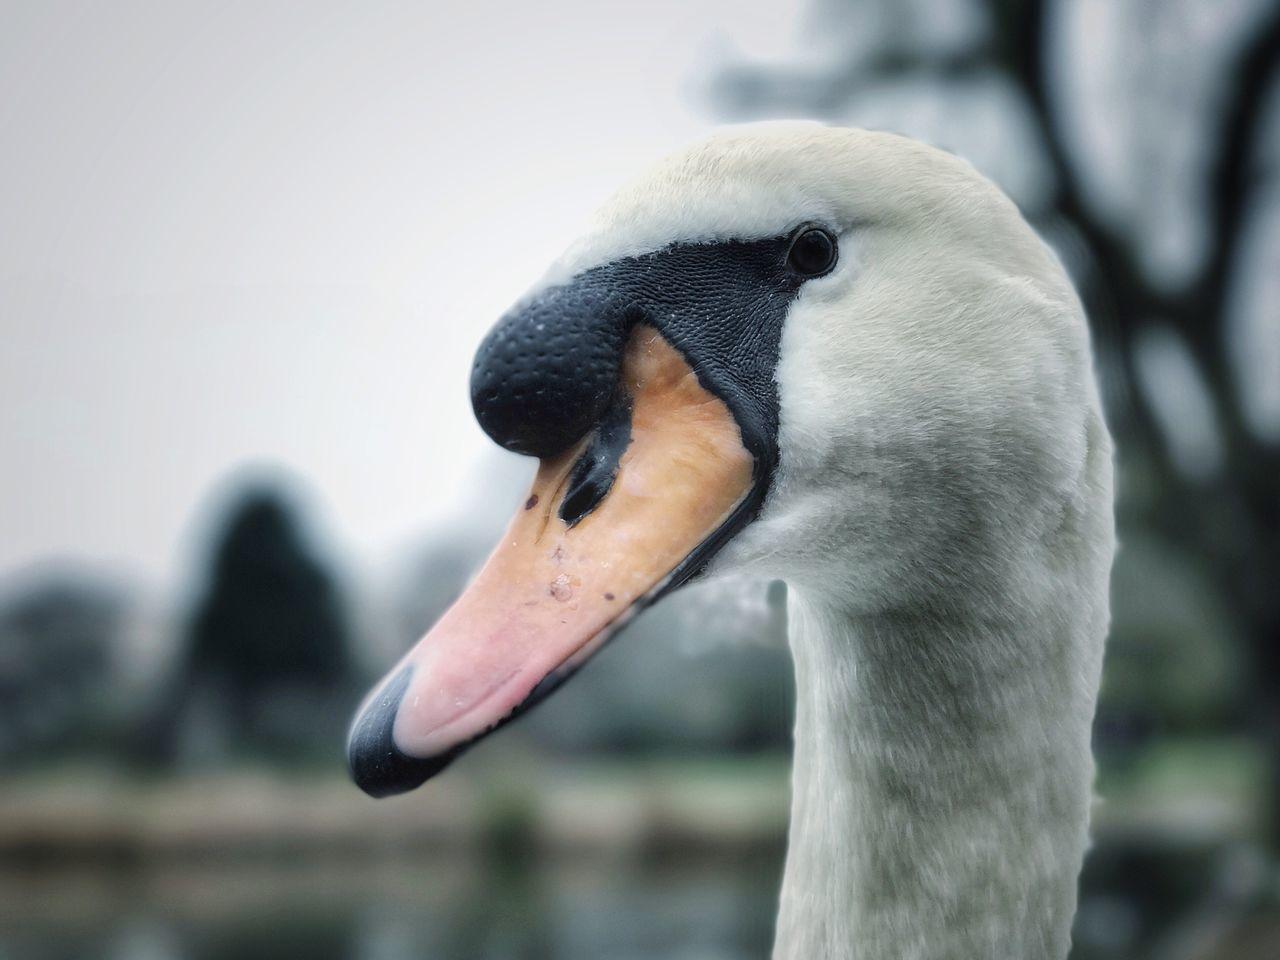 bird, animals in the wild, animal themes, focus on foreground, beak, one animal, animal wildlife, no people, day, close-up, outdoors, nature, lake, swan